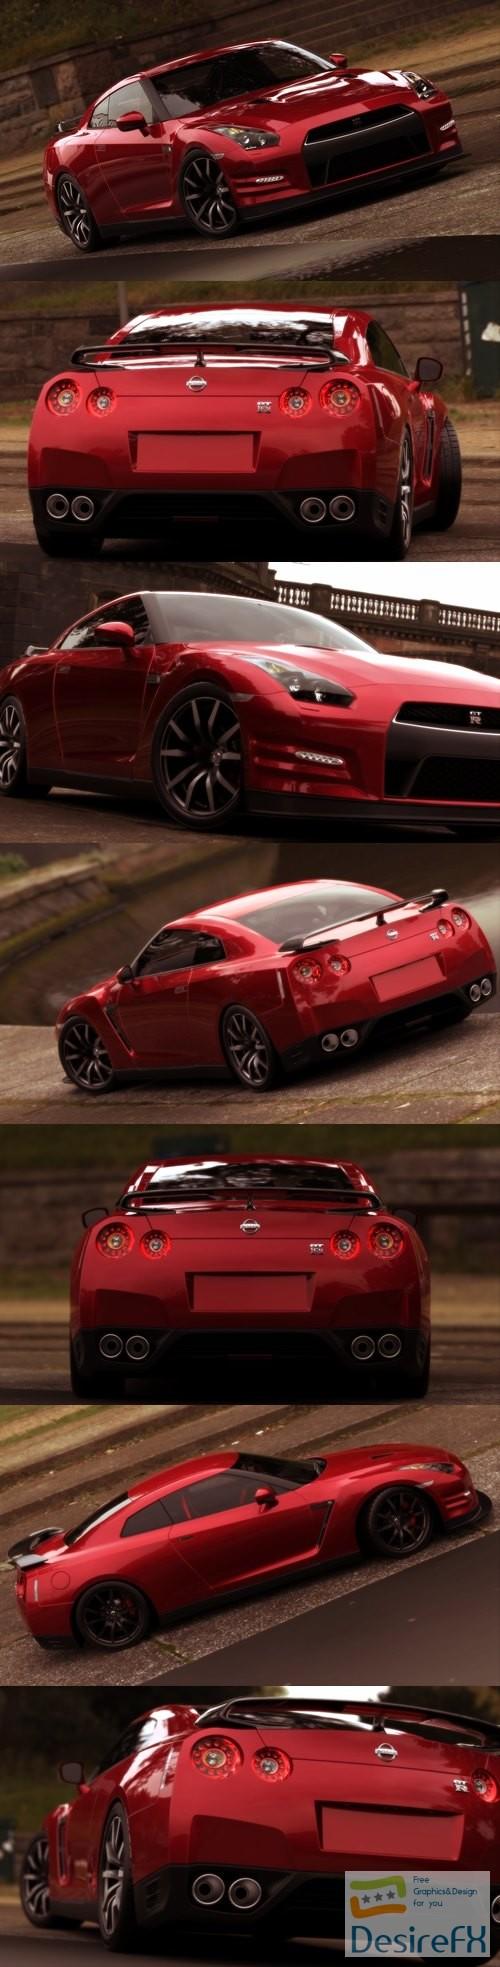 Nissan GT-R 2012 3D Model